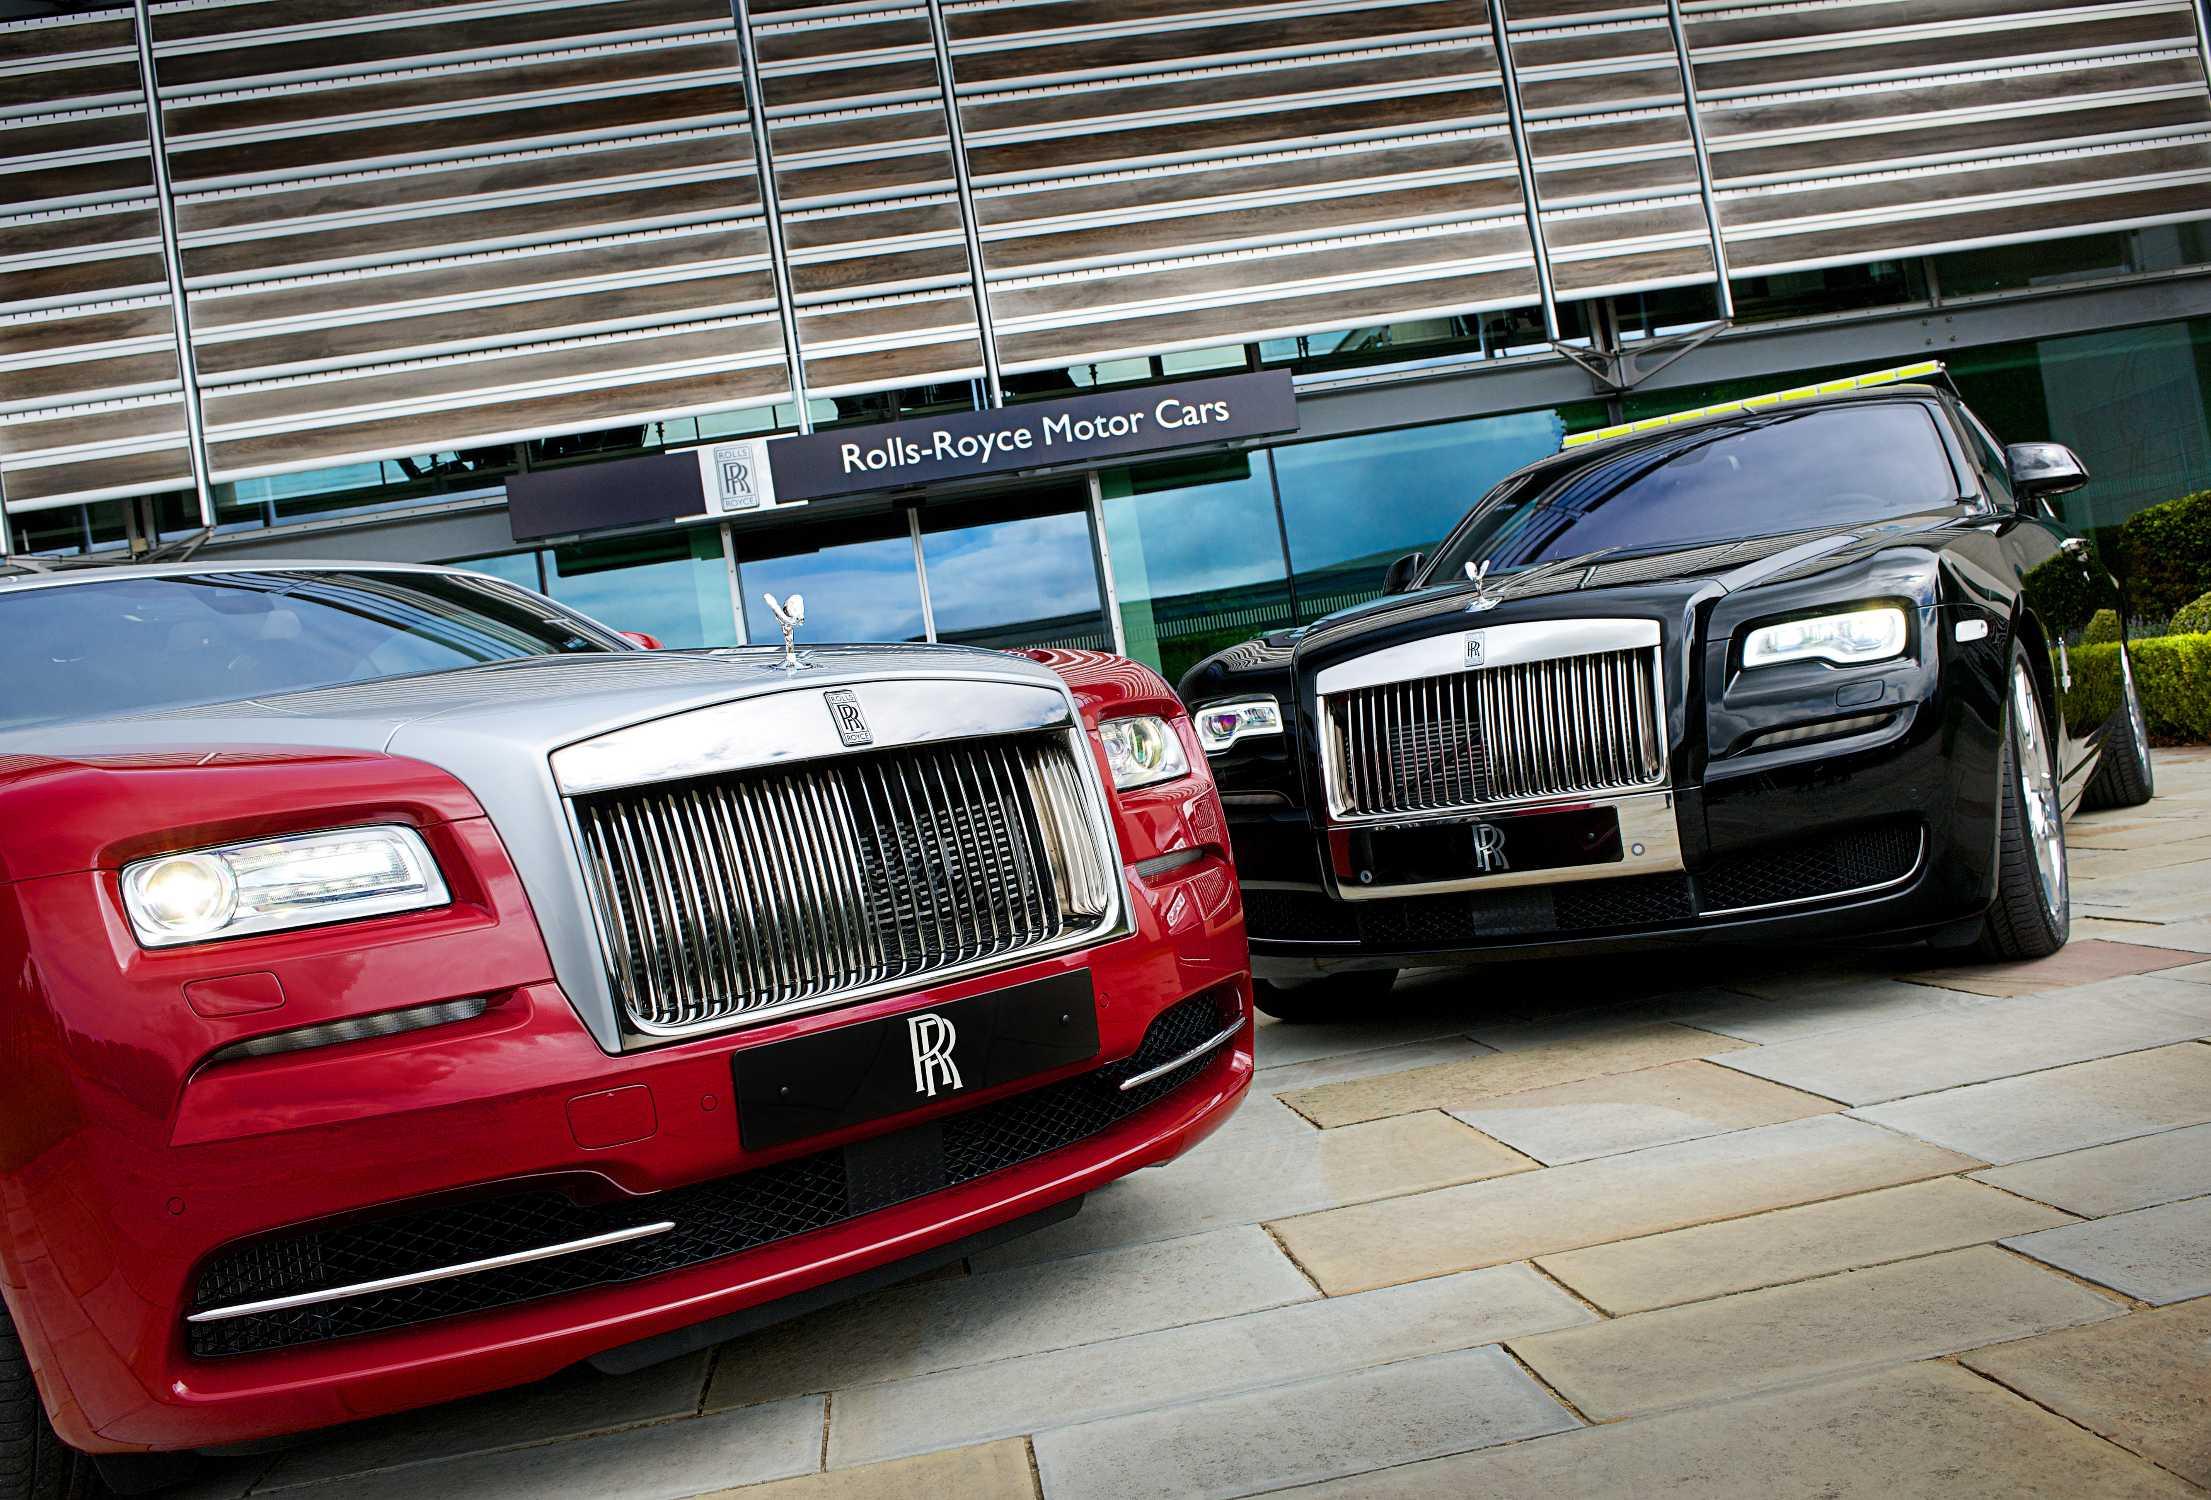 Rolls royce celebrates 2015 goodwood festival of speed for Rolls royce motor cars